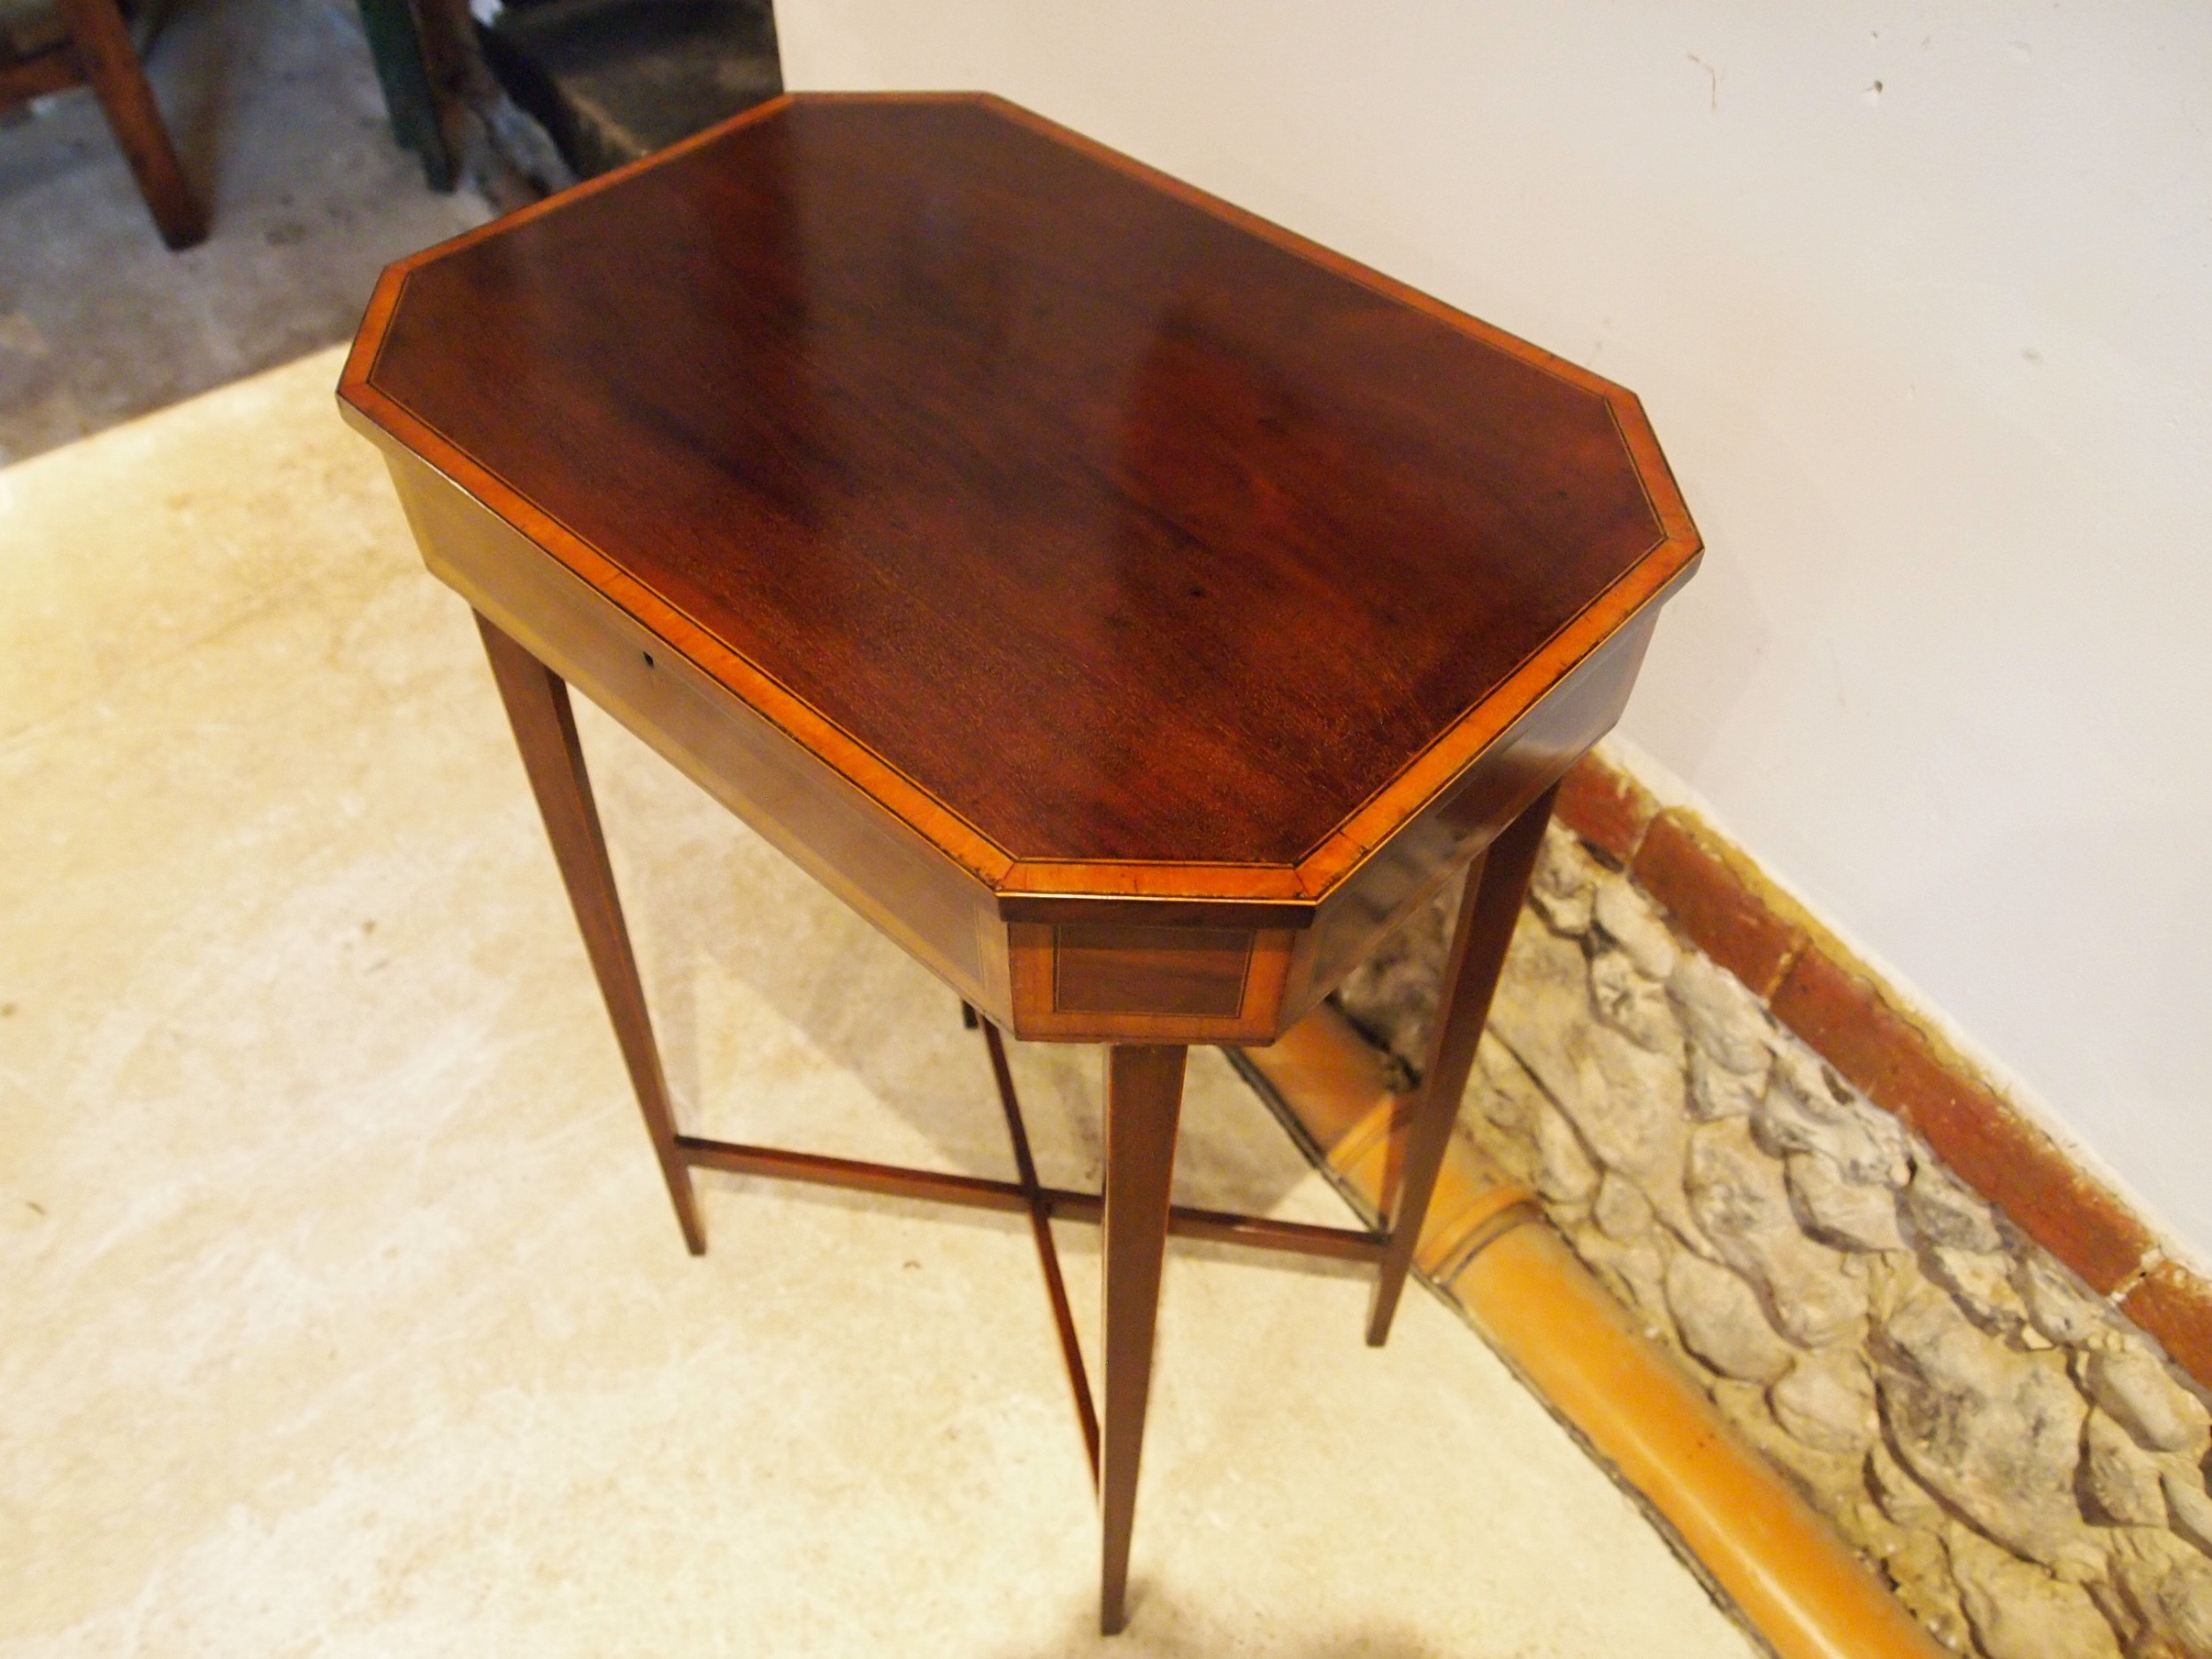 table fine george iii mahogany sheraton side hall lamp c1790